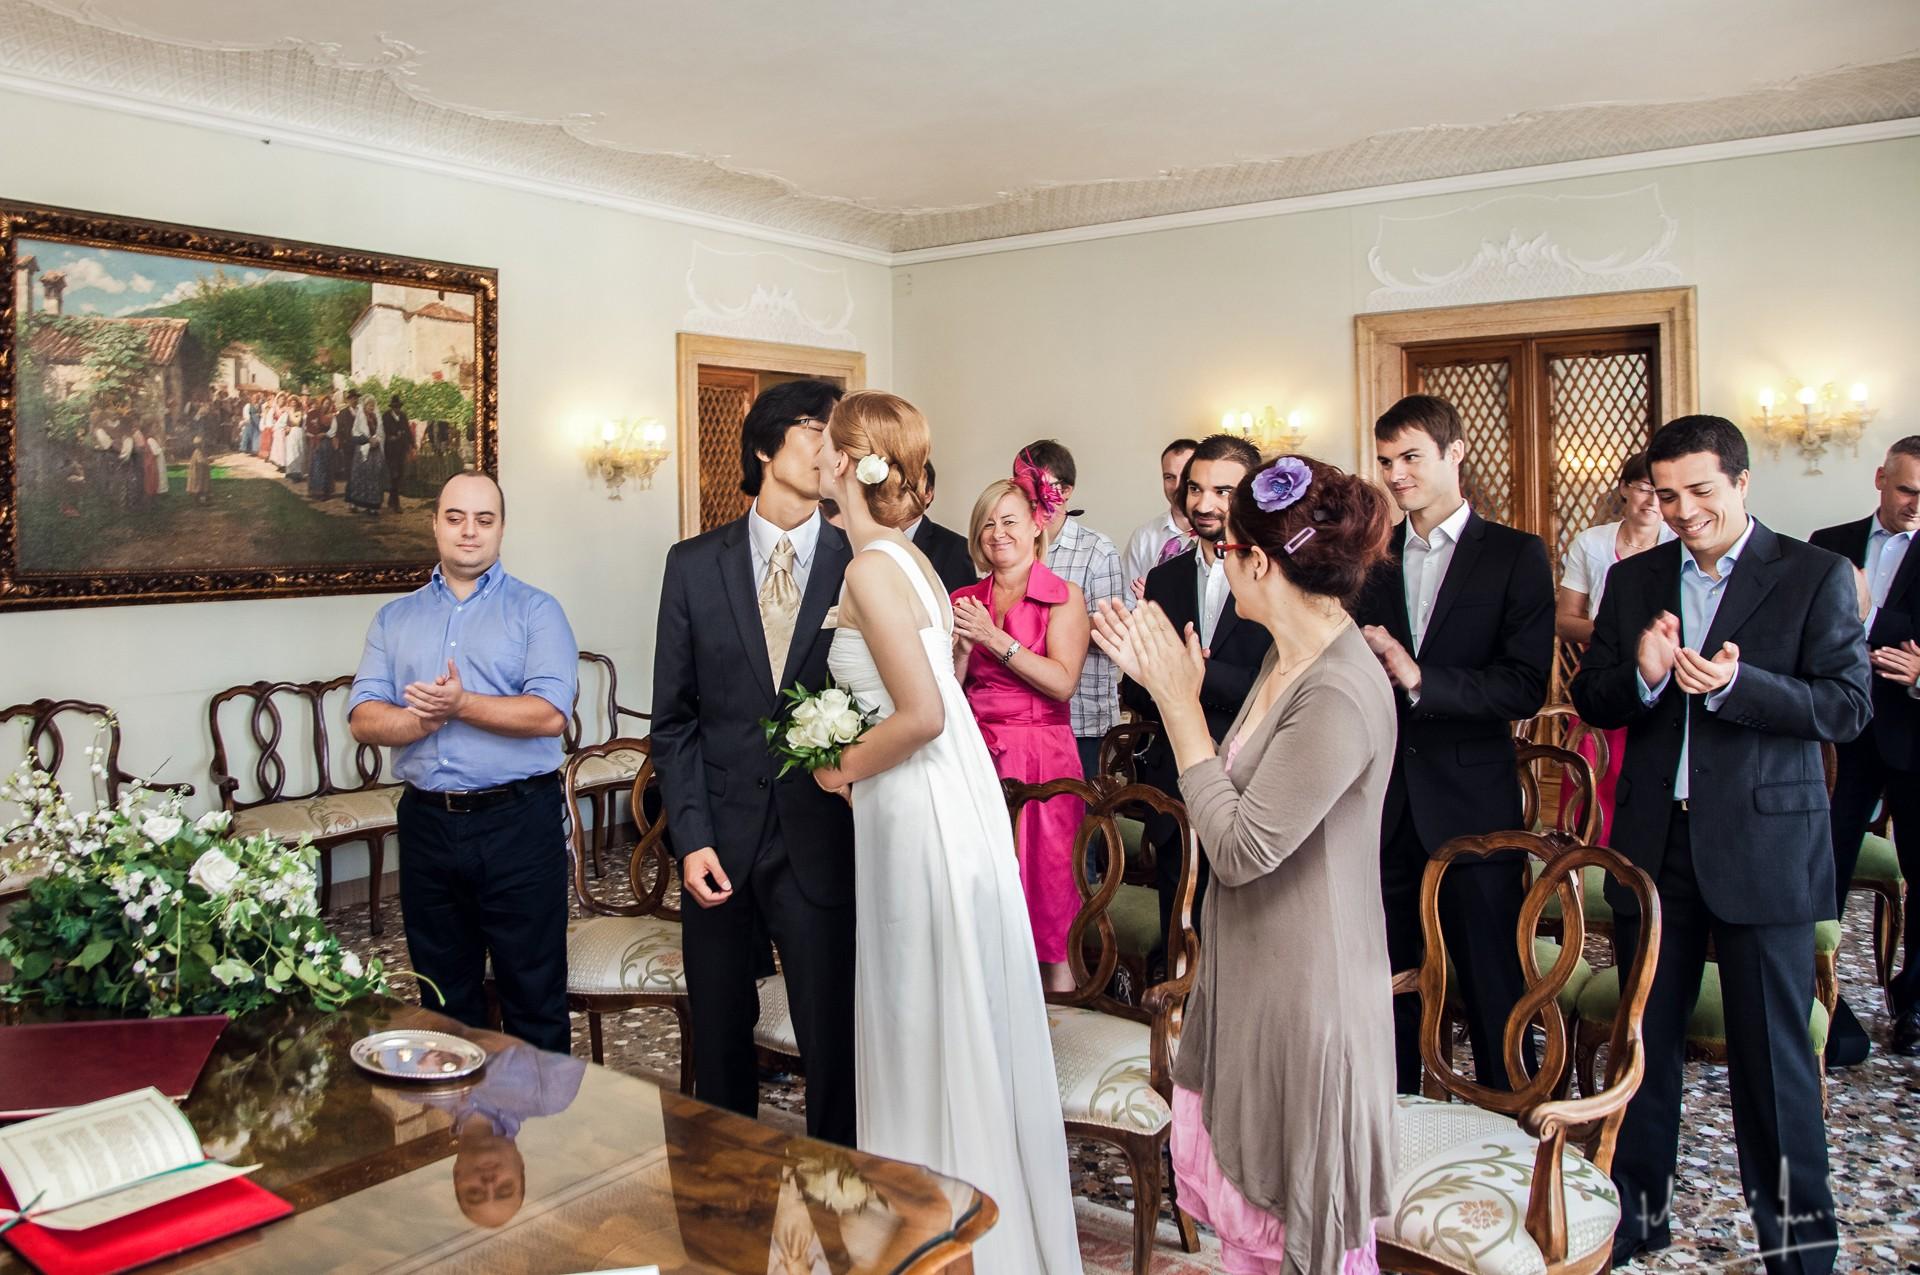 Ślub w wenecji 31 Manuela Luiza & Young Seon Song